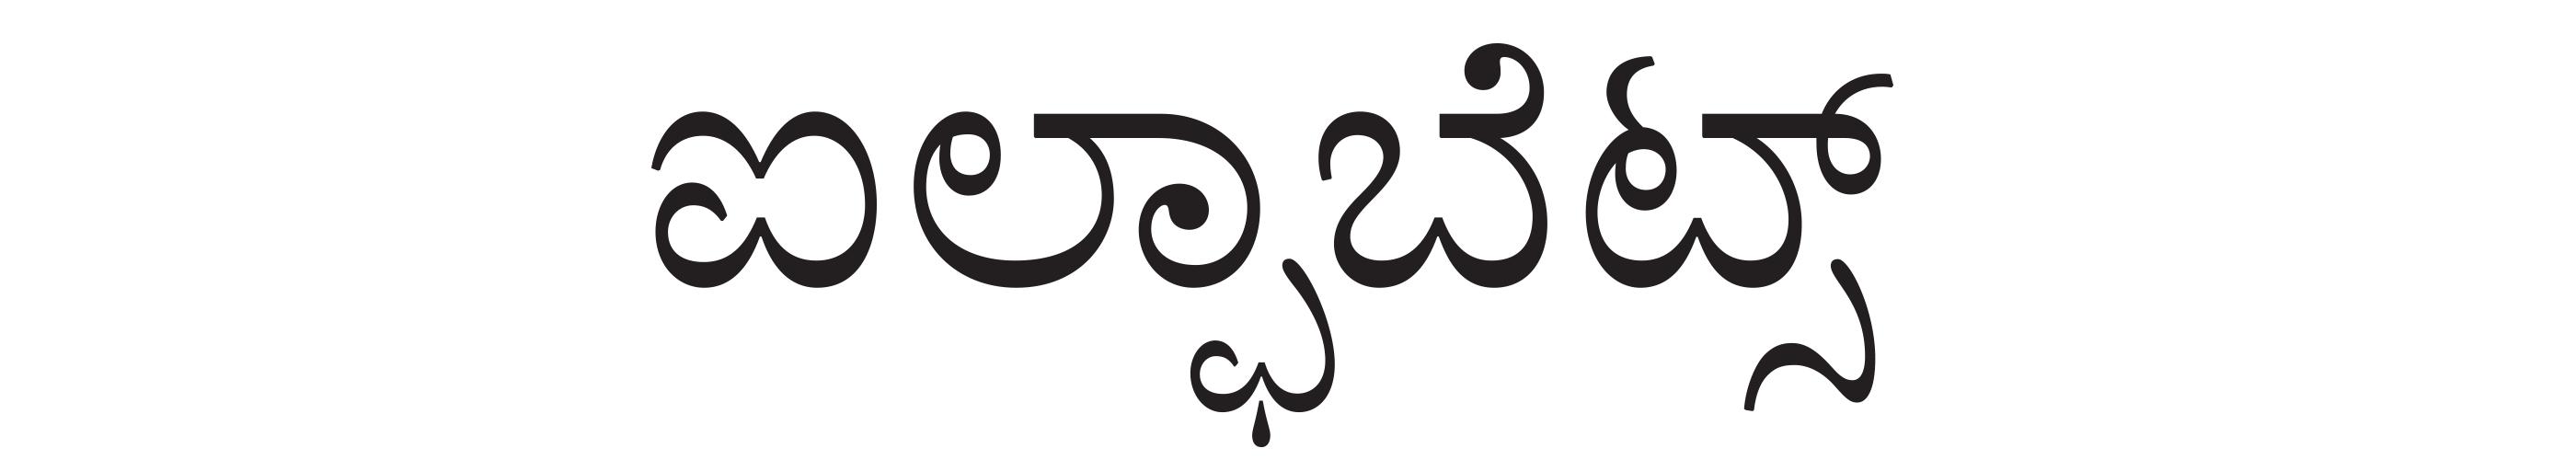 alphabettes_kannada_header